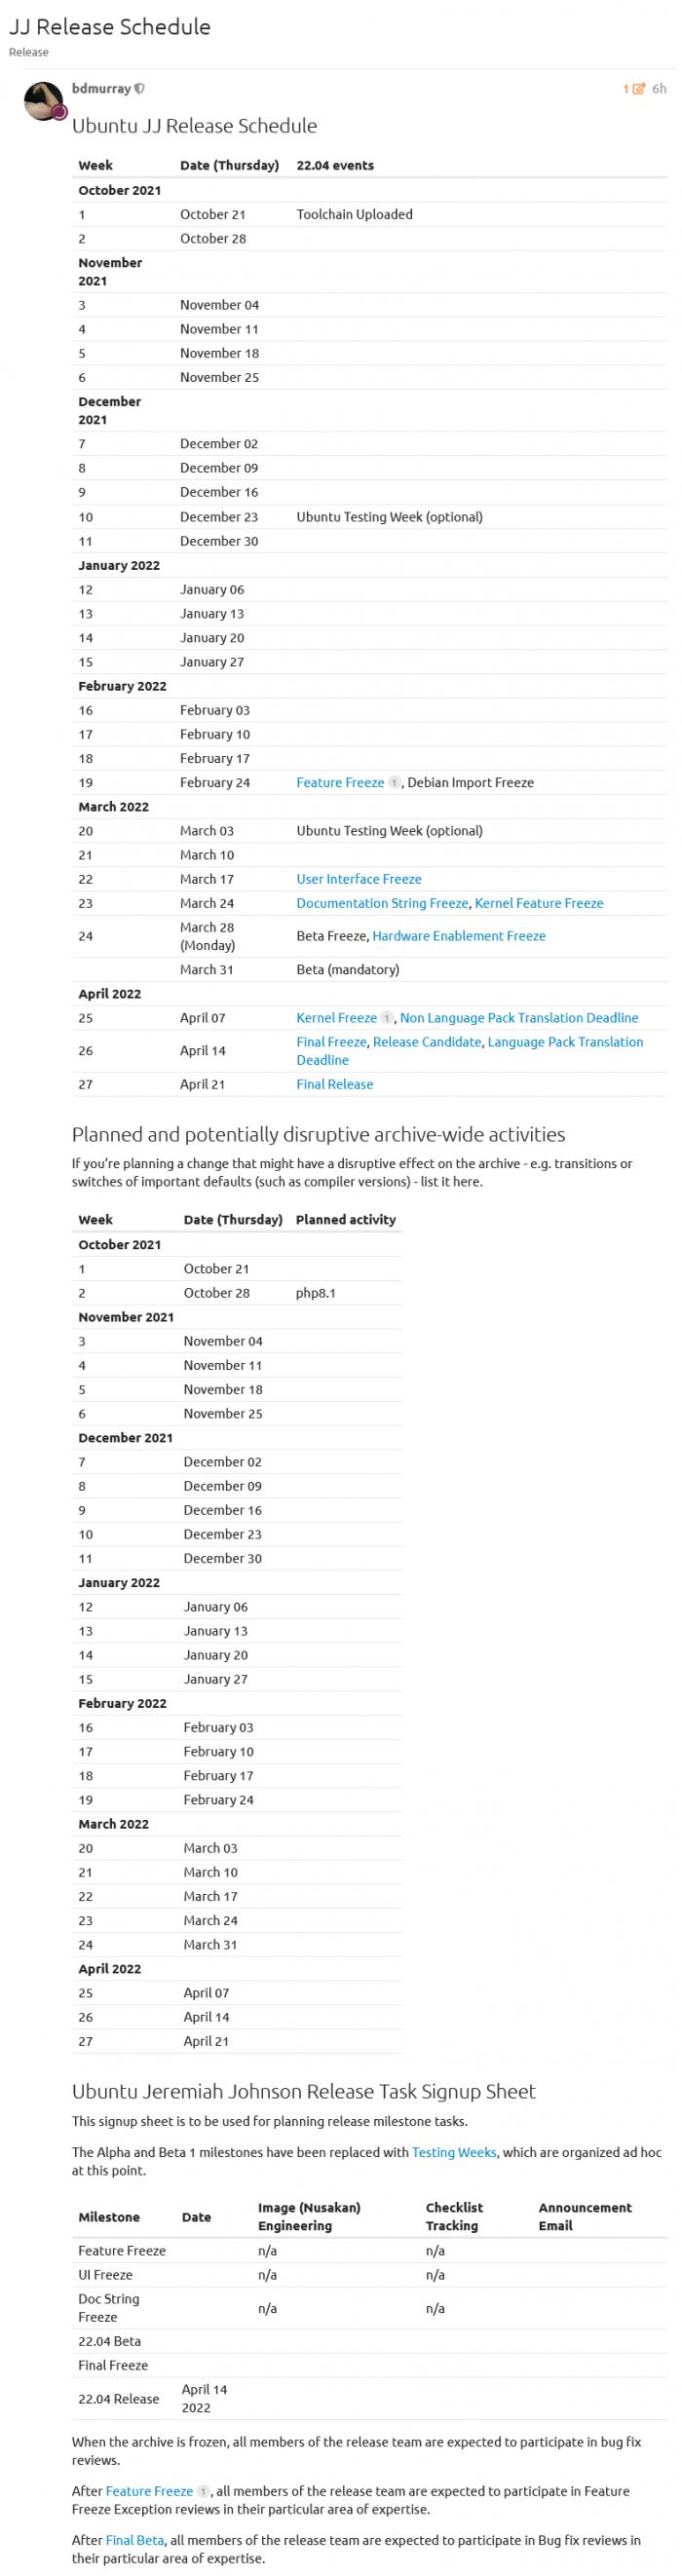 Screenshot 2021-08-27 at 14-12-25 JJ Release Schedule.png